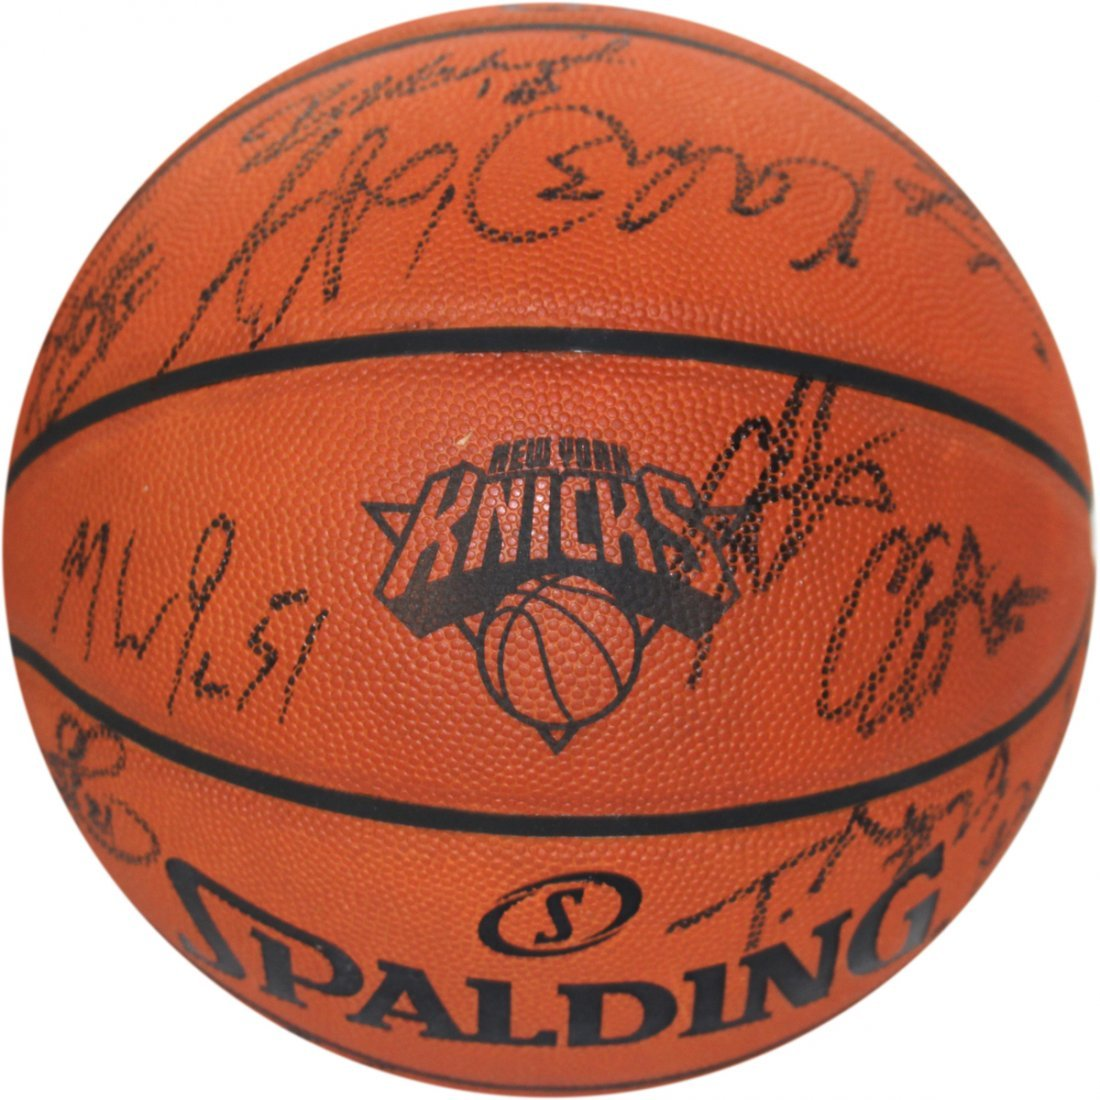 New York Knicks 2013-2014 Team Signed Knicks Engraved L